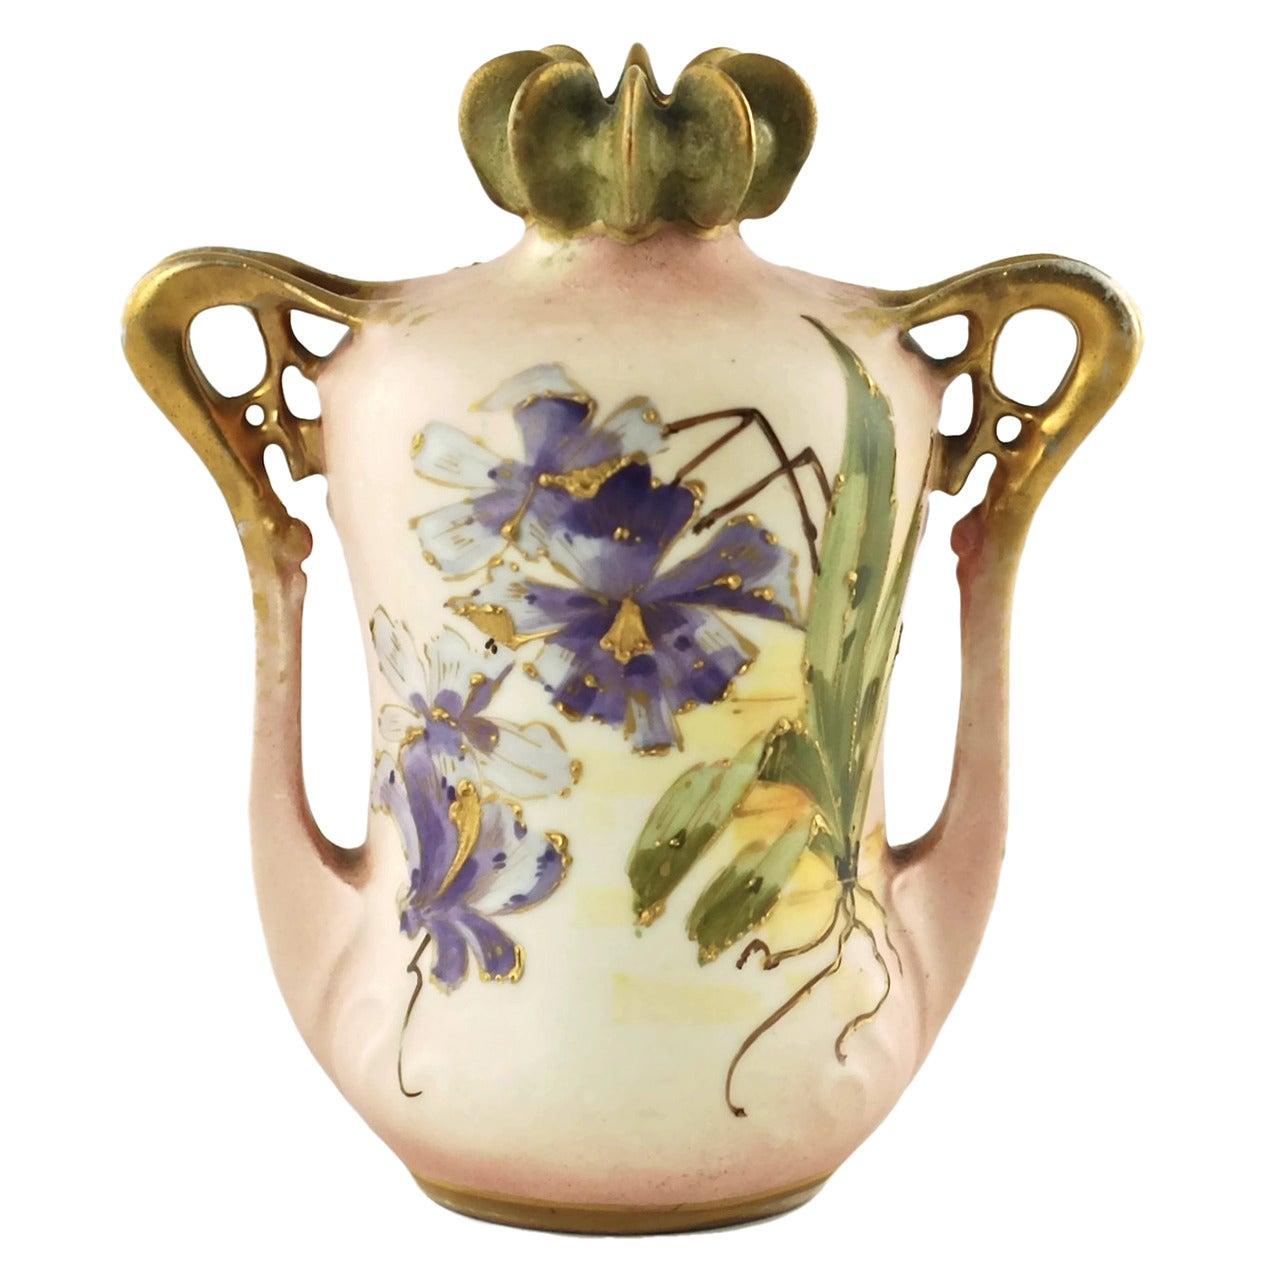 Paul Dachsel for Riessner, Stellmacher and Kessel Amphora Porcelain Vase